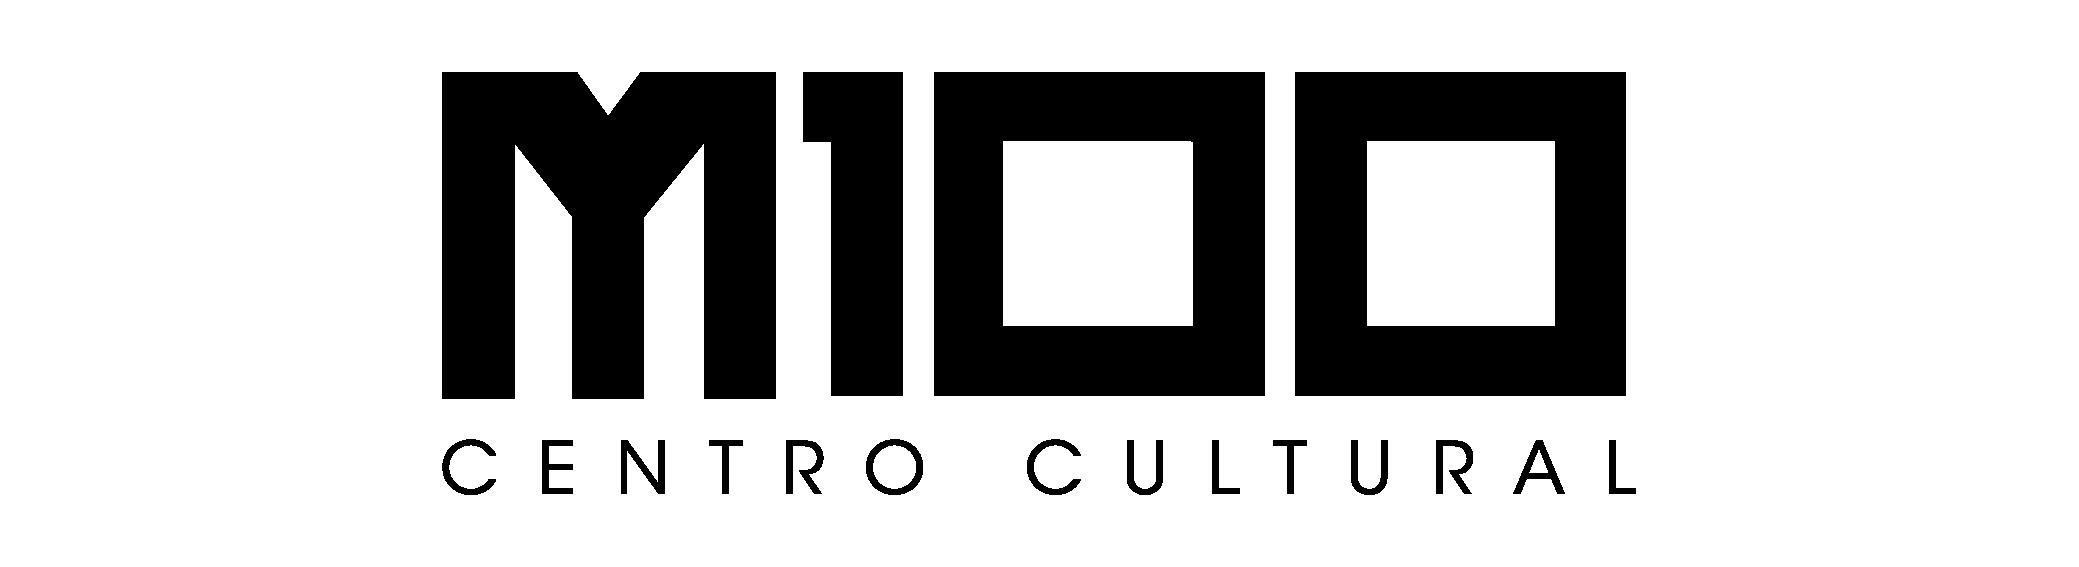 logom100.png